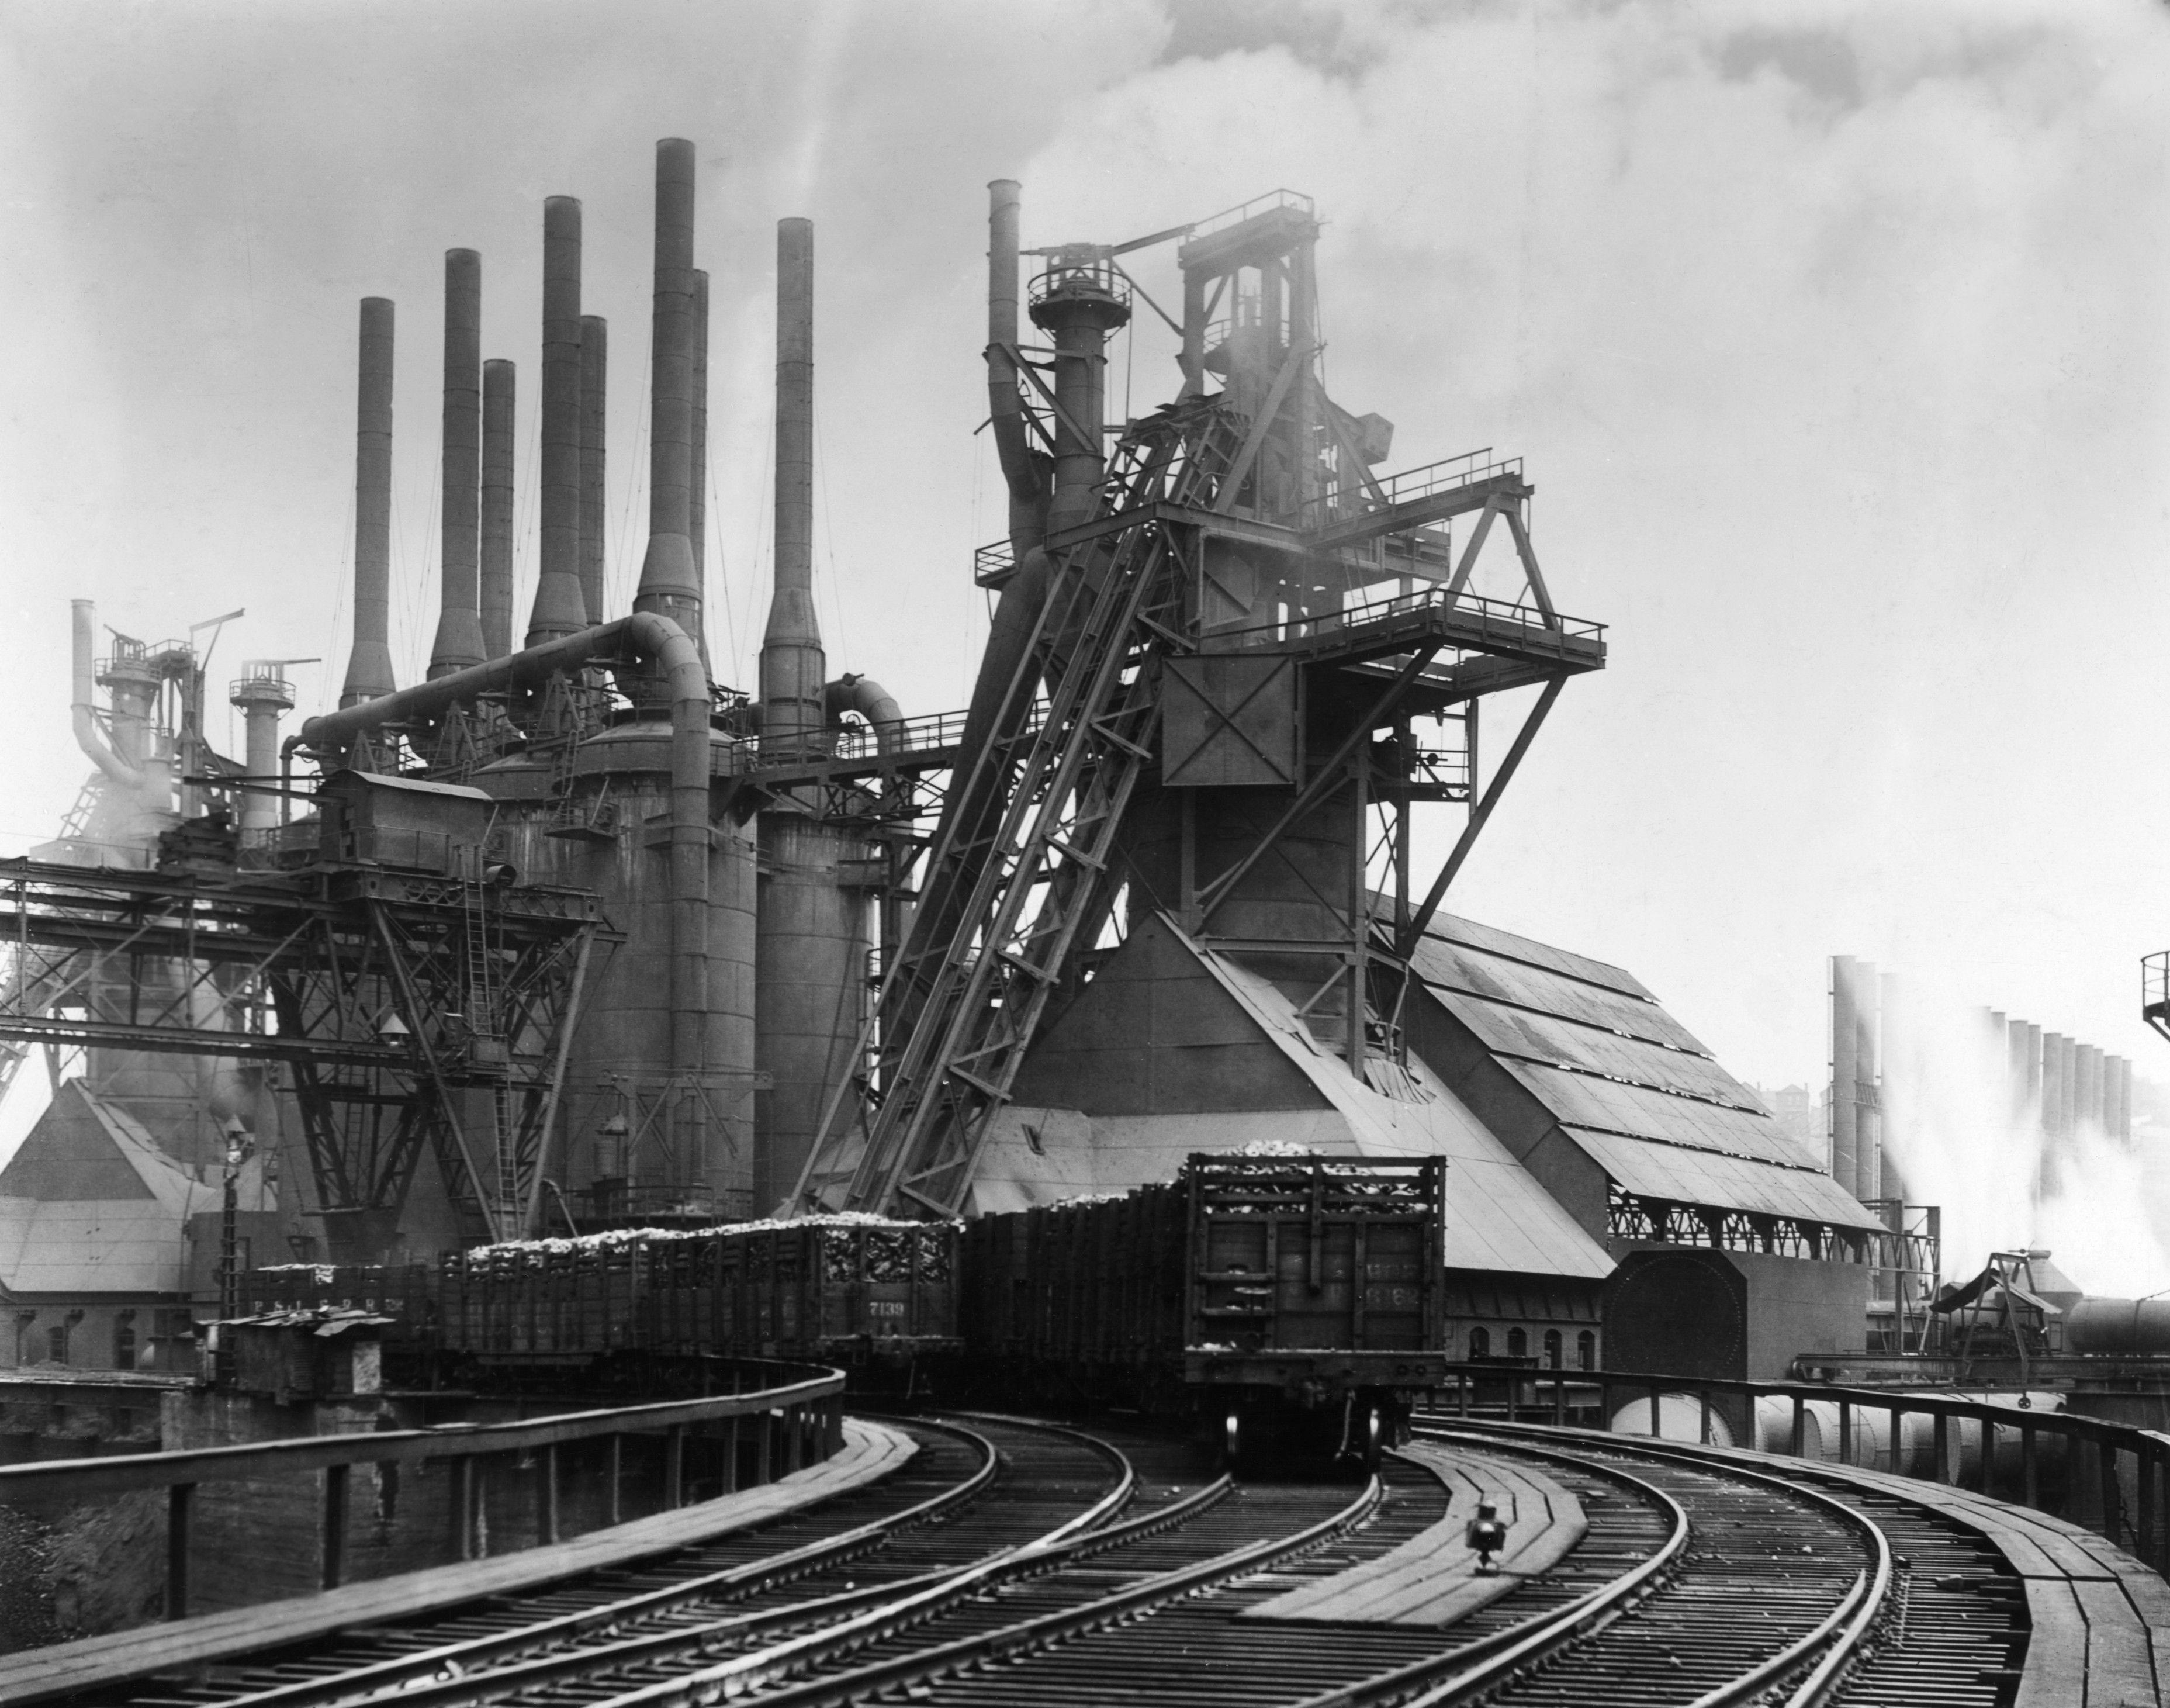 blast furnaces of the carnegie steel corporation in